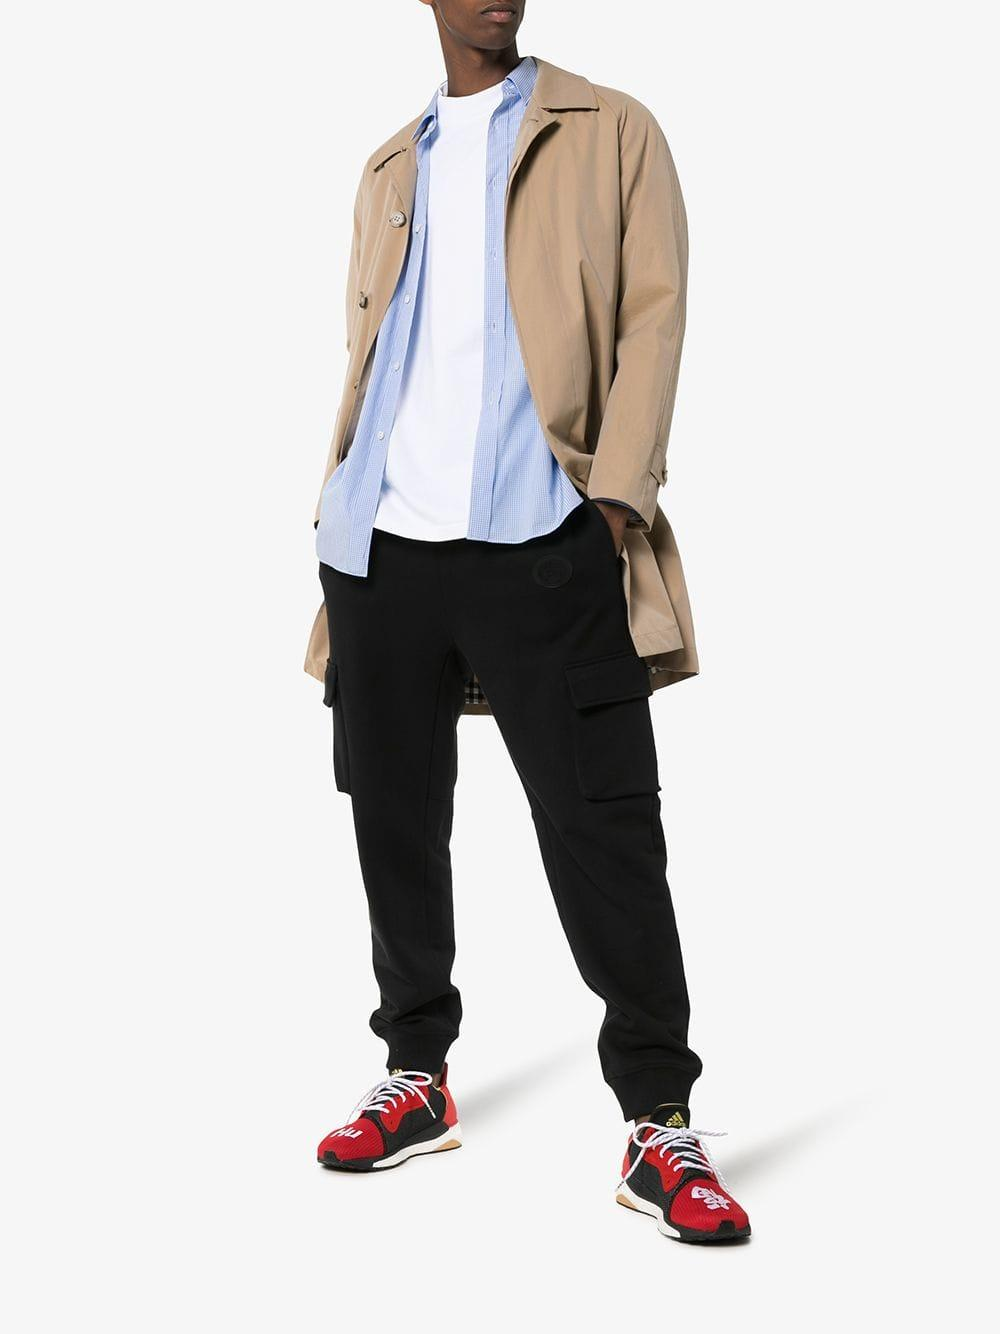 90cf0cc0fbe Adidas - Red And Black X Pharrell Williams Solar Hu Glide St Sneakers for  Men -. View fullscreen